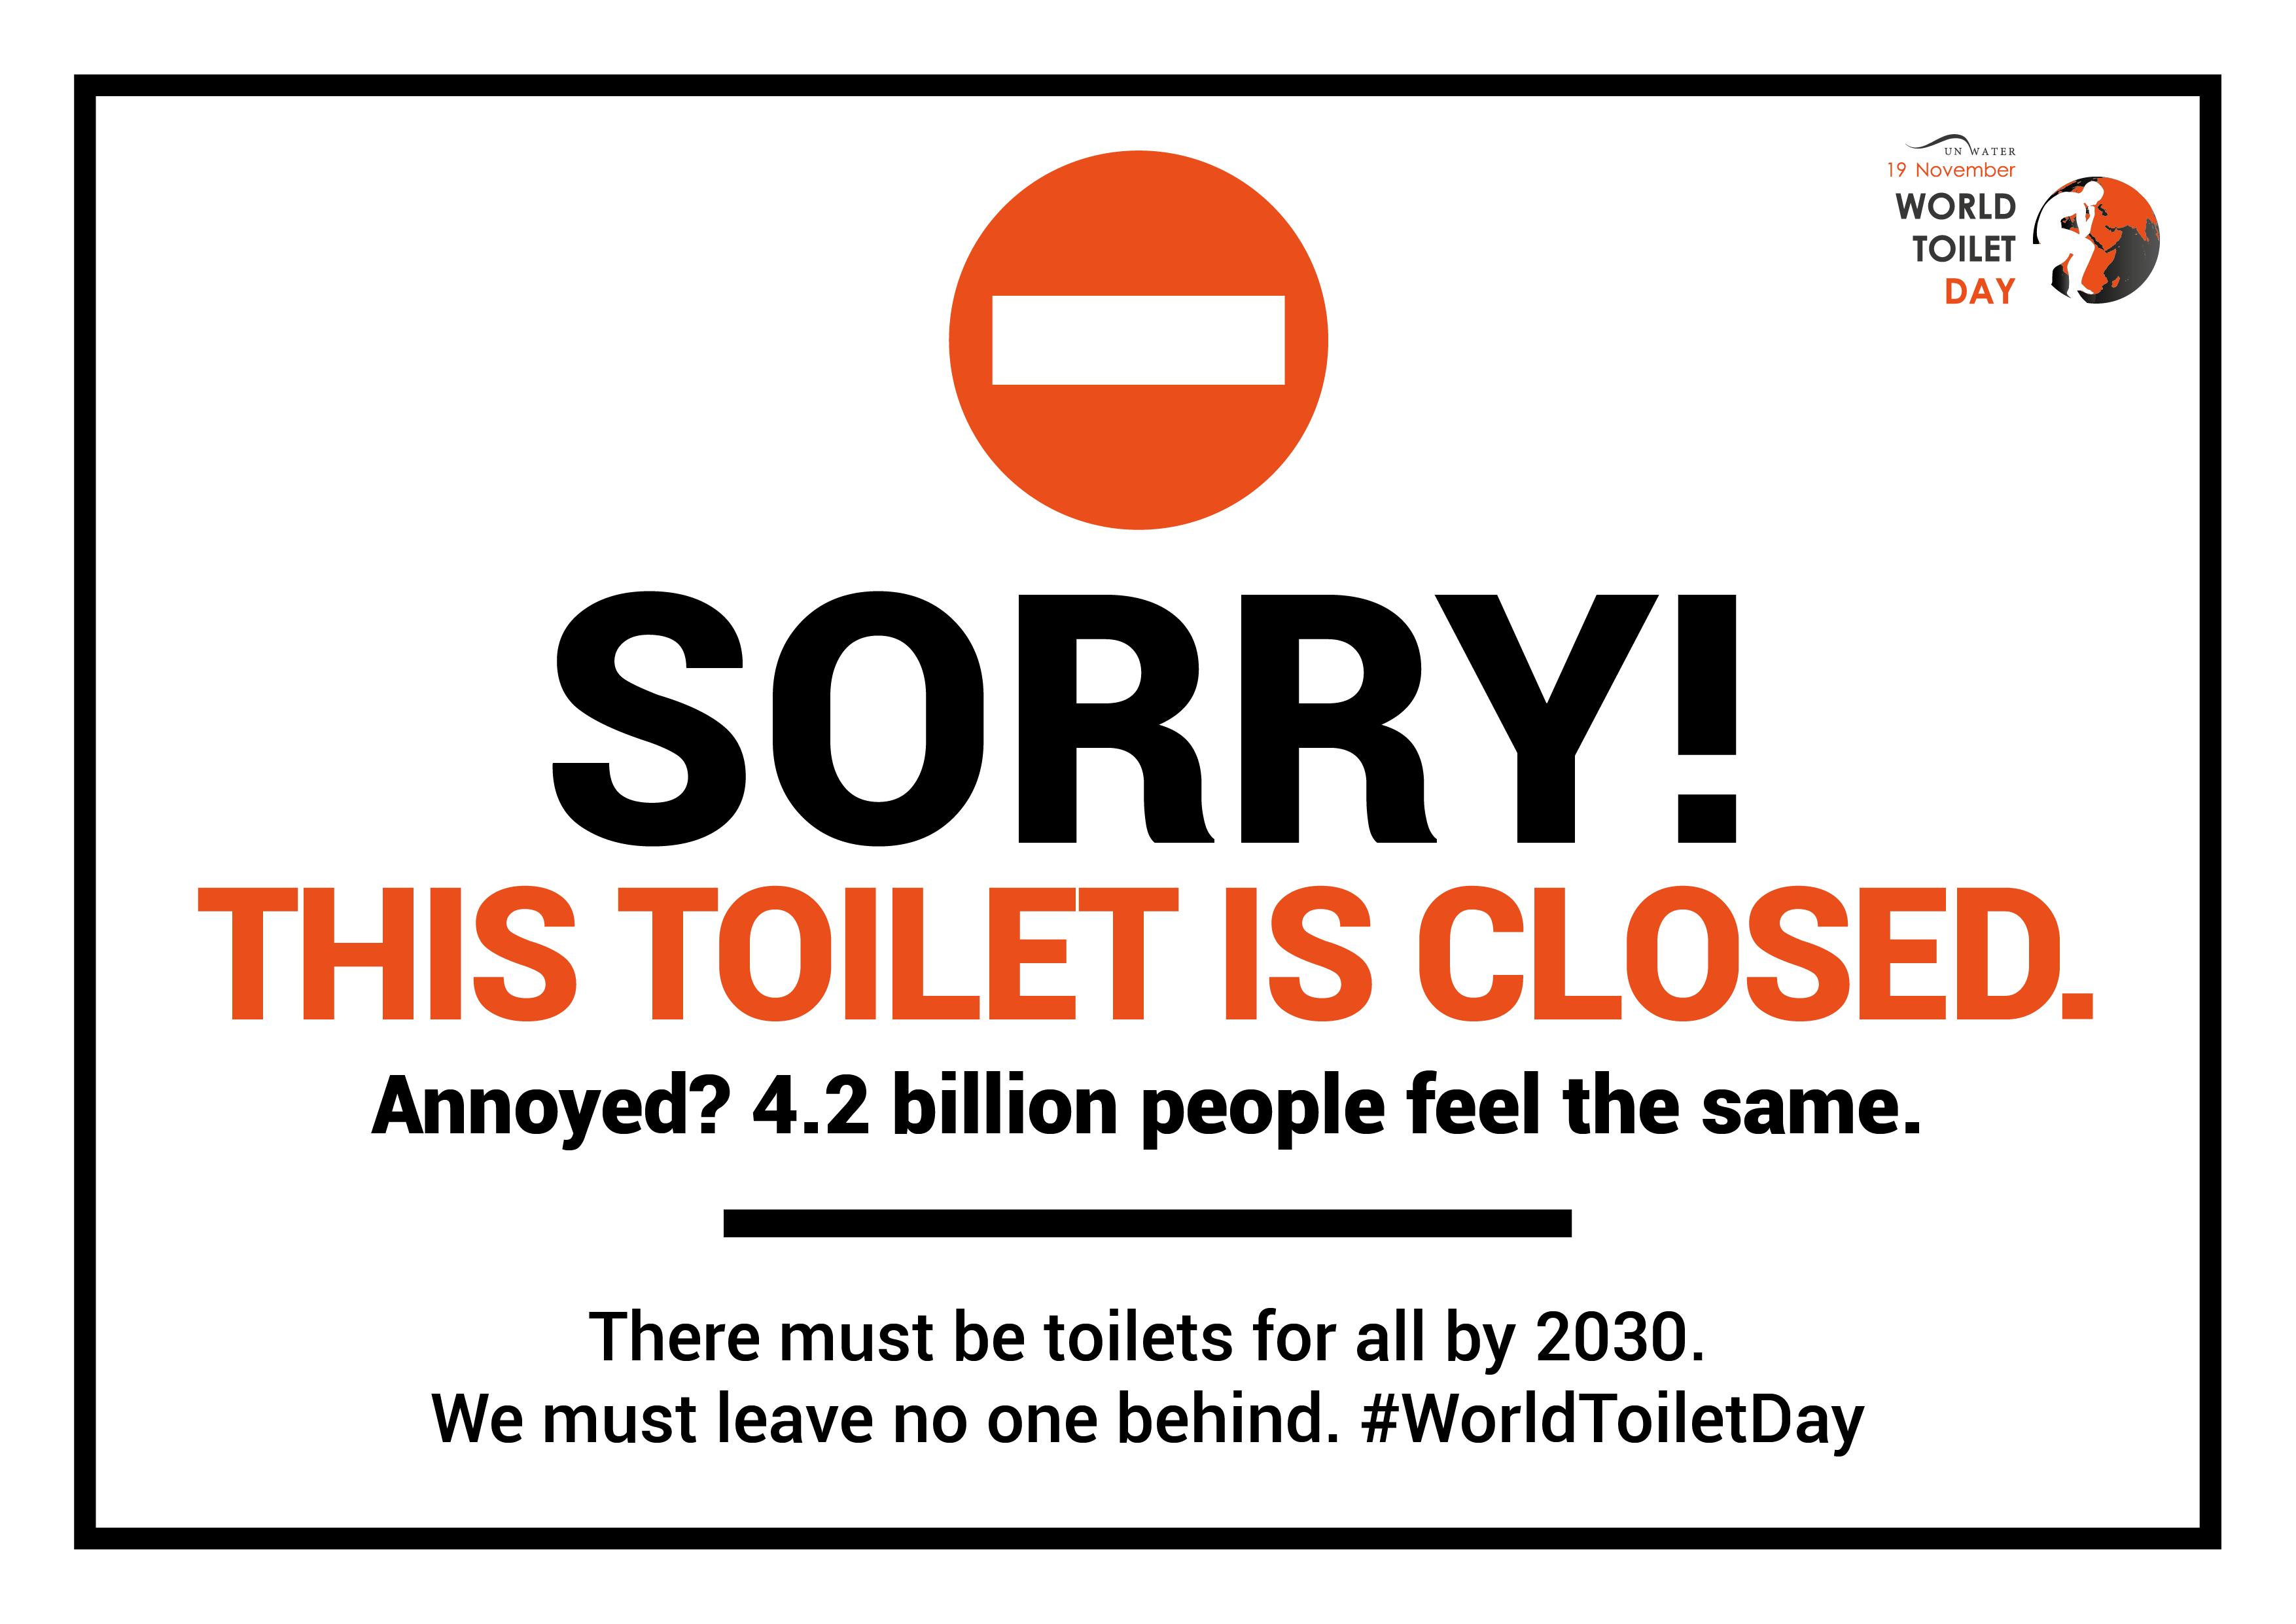 World Toilet Day: 19th November